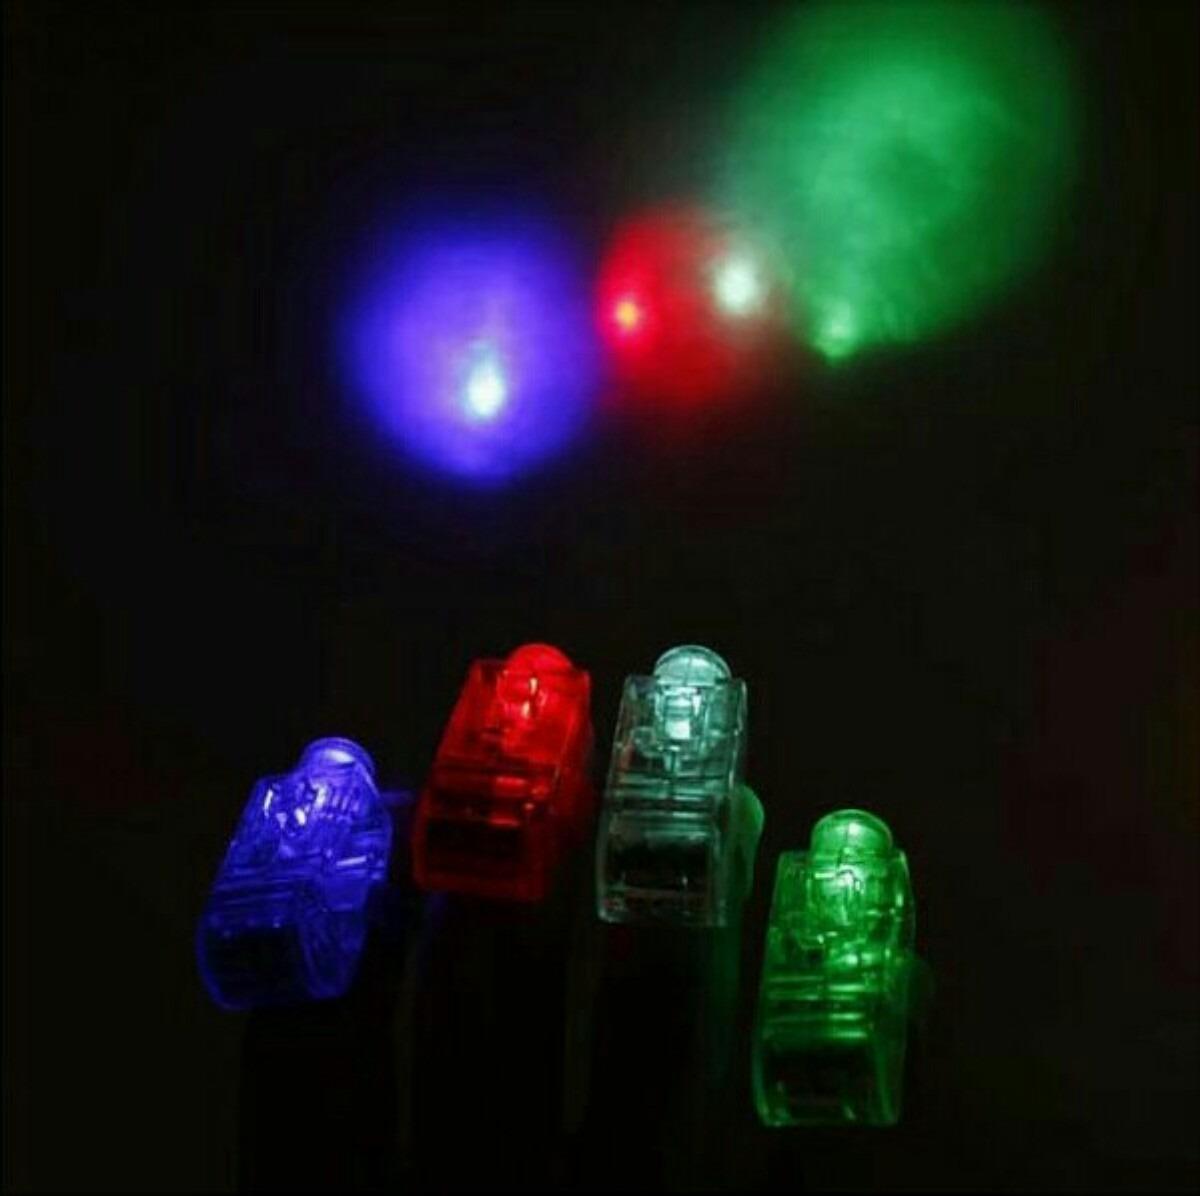 Suministro de hora loca luces led para dedo en colores - Luces led de colores ...